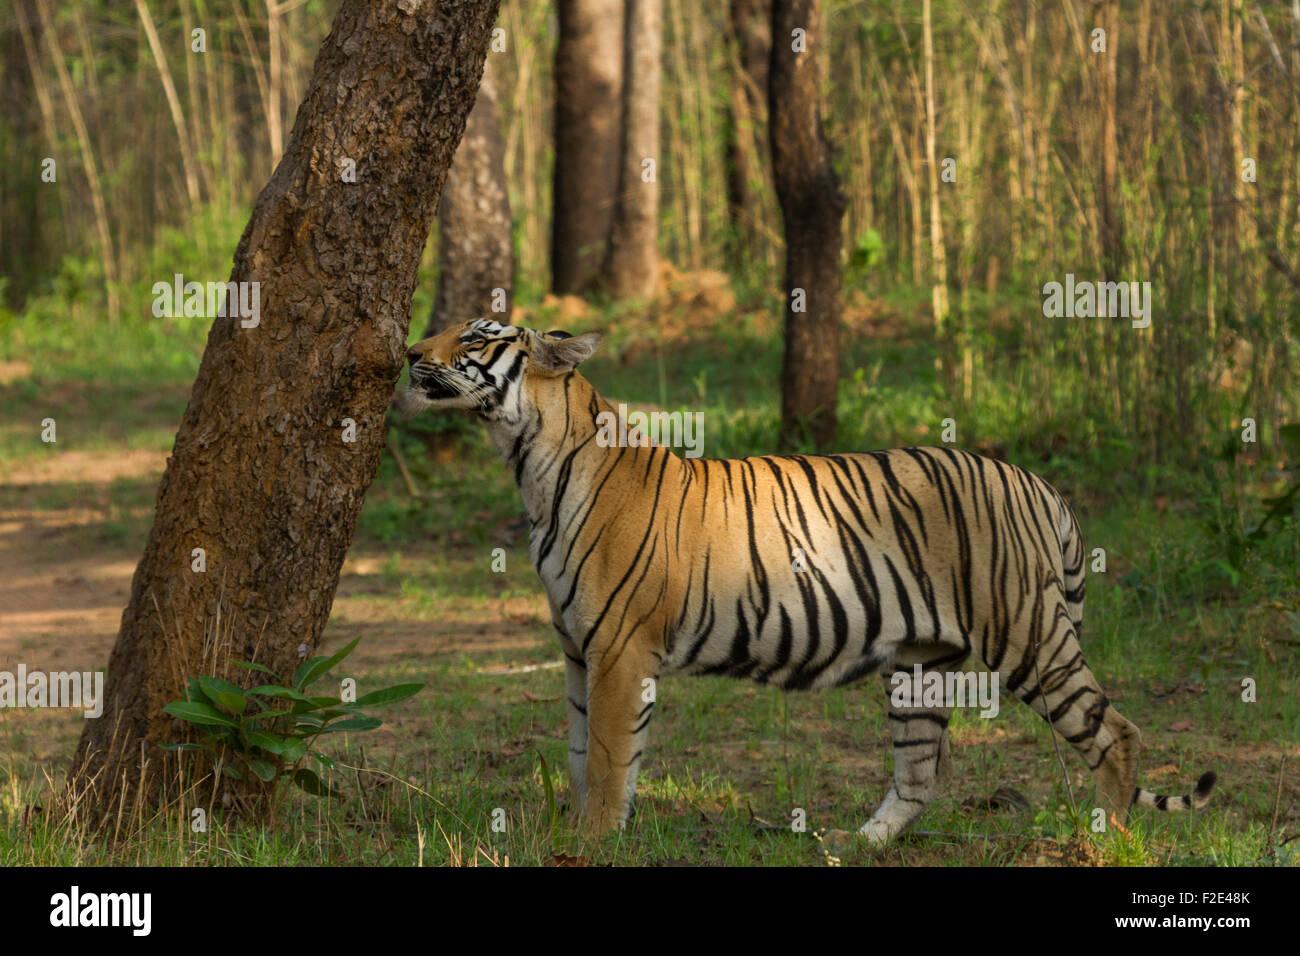 Royal Bengal Tiger or Panthera Tigris doing Scent marking at Tadoba National Park, Maharashtra, India - Stock Image